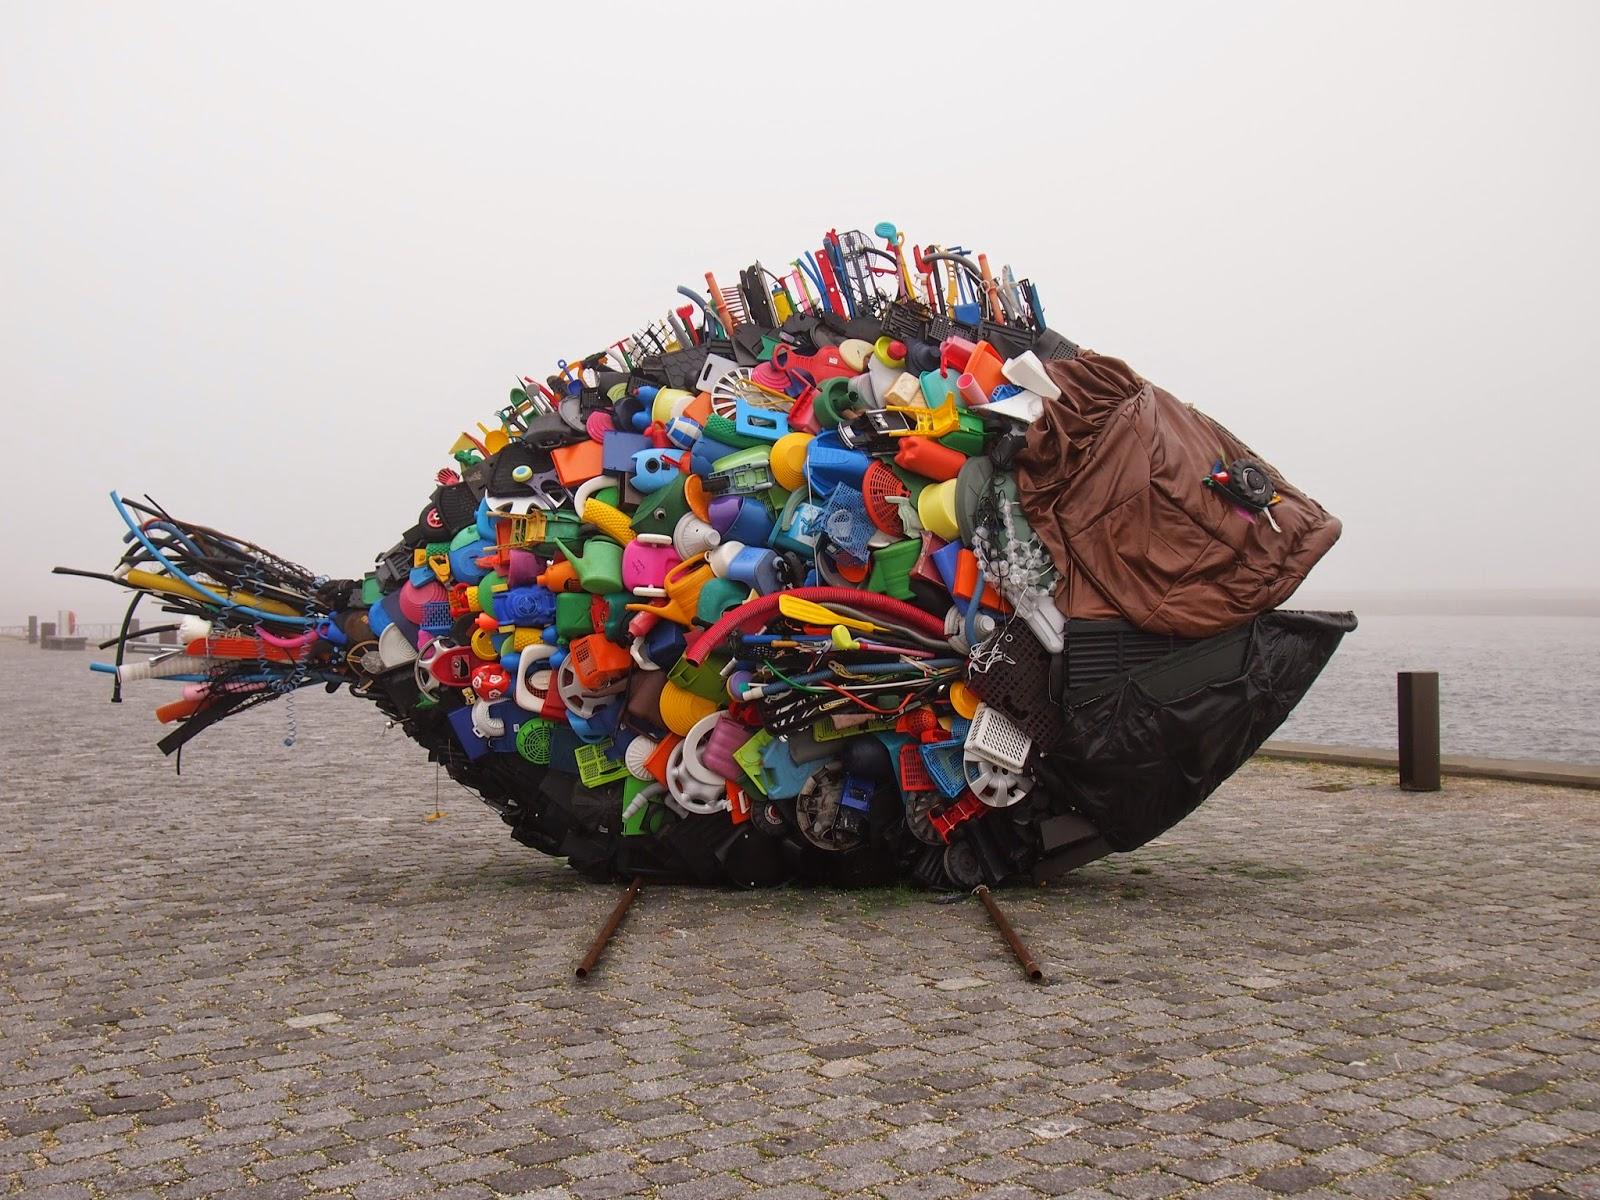 fish sculpture made of trash in helsingor